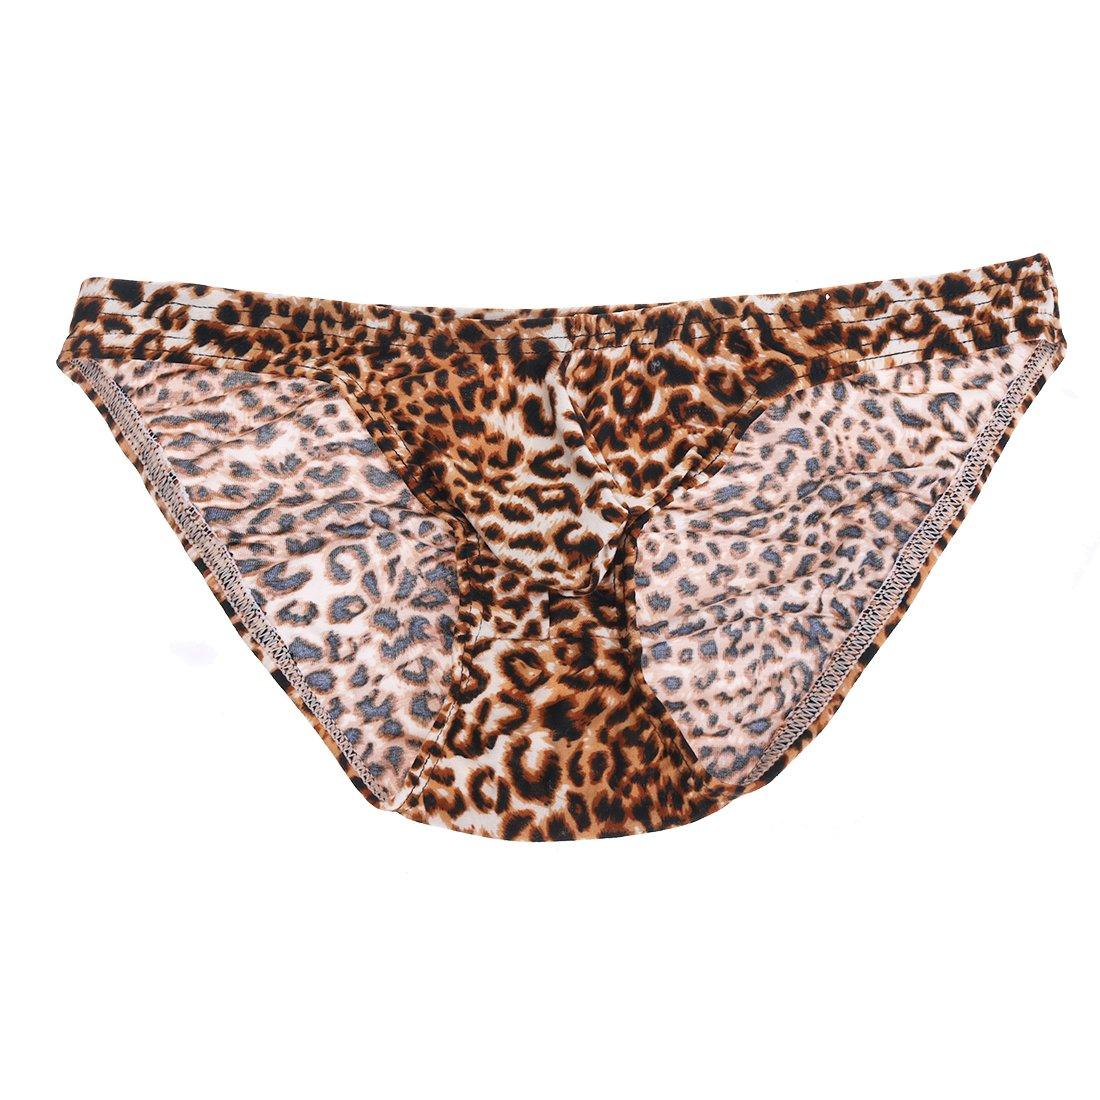 96ed8cf8a9 Amazon.com: YiZYiF Sexy Men's Underwear Leopard Print Bikini Swimwear  Panties: Clothing